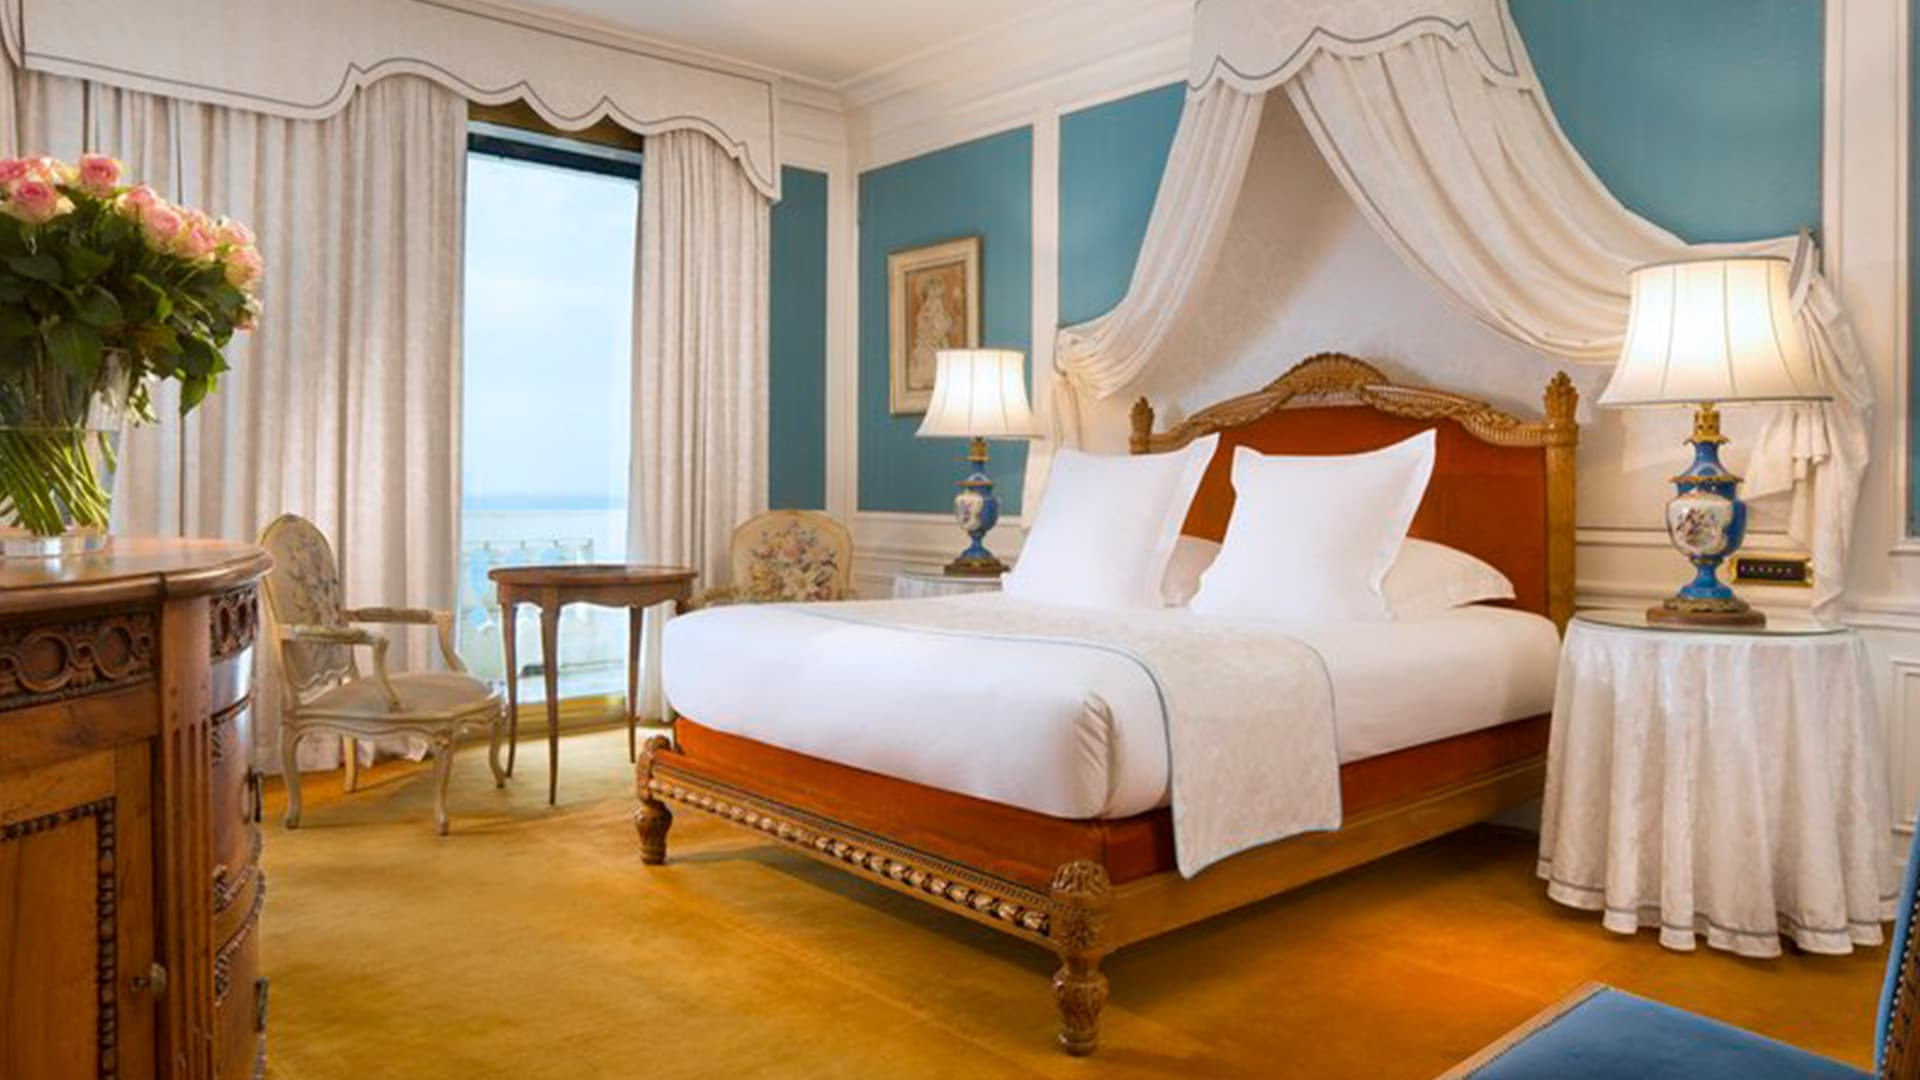 Hôtel 5 étoiles à Nice